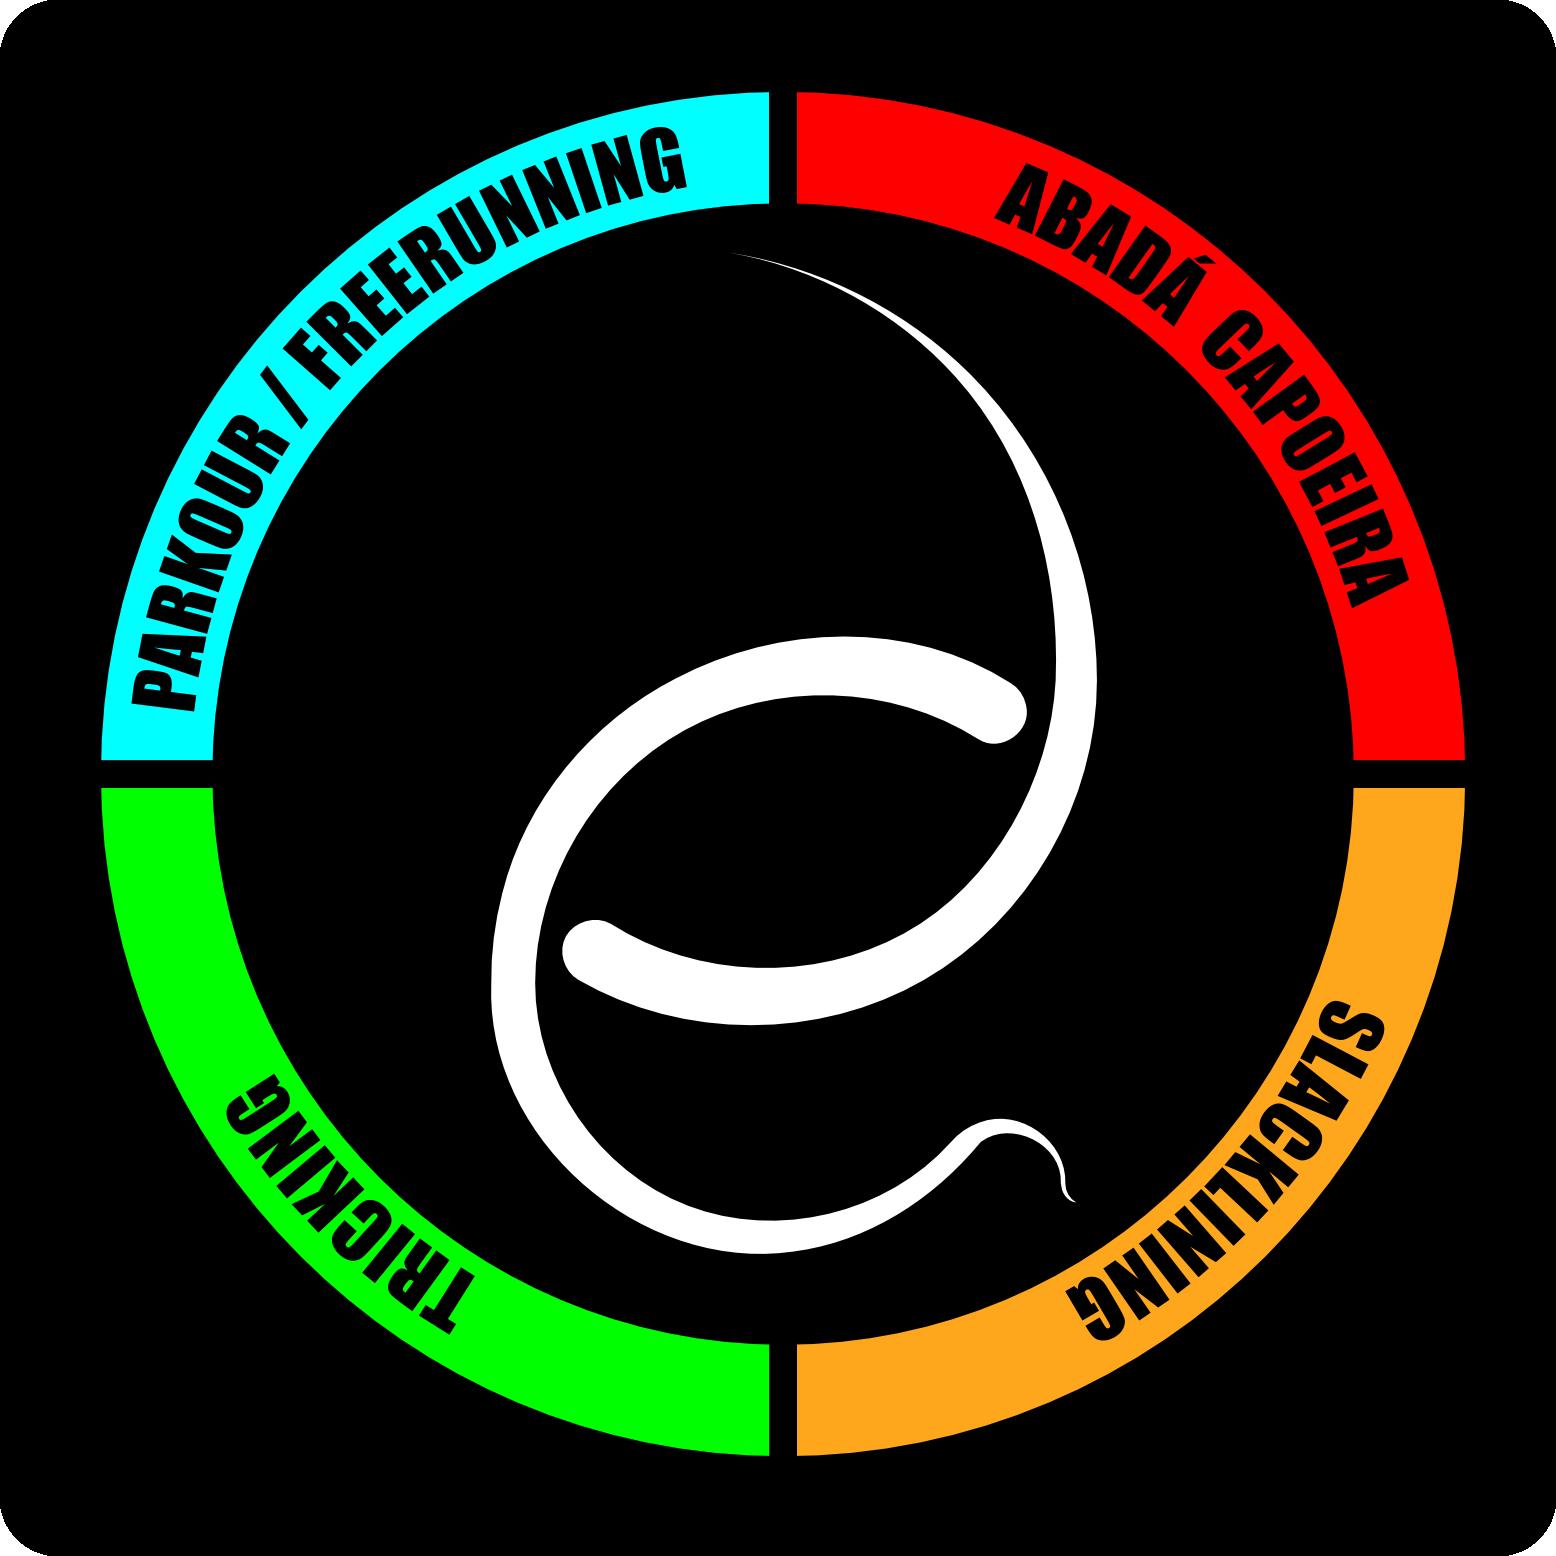 Capoeira - Brasilianische Kampfkunst